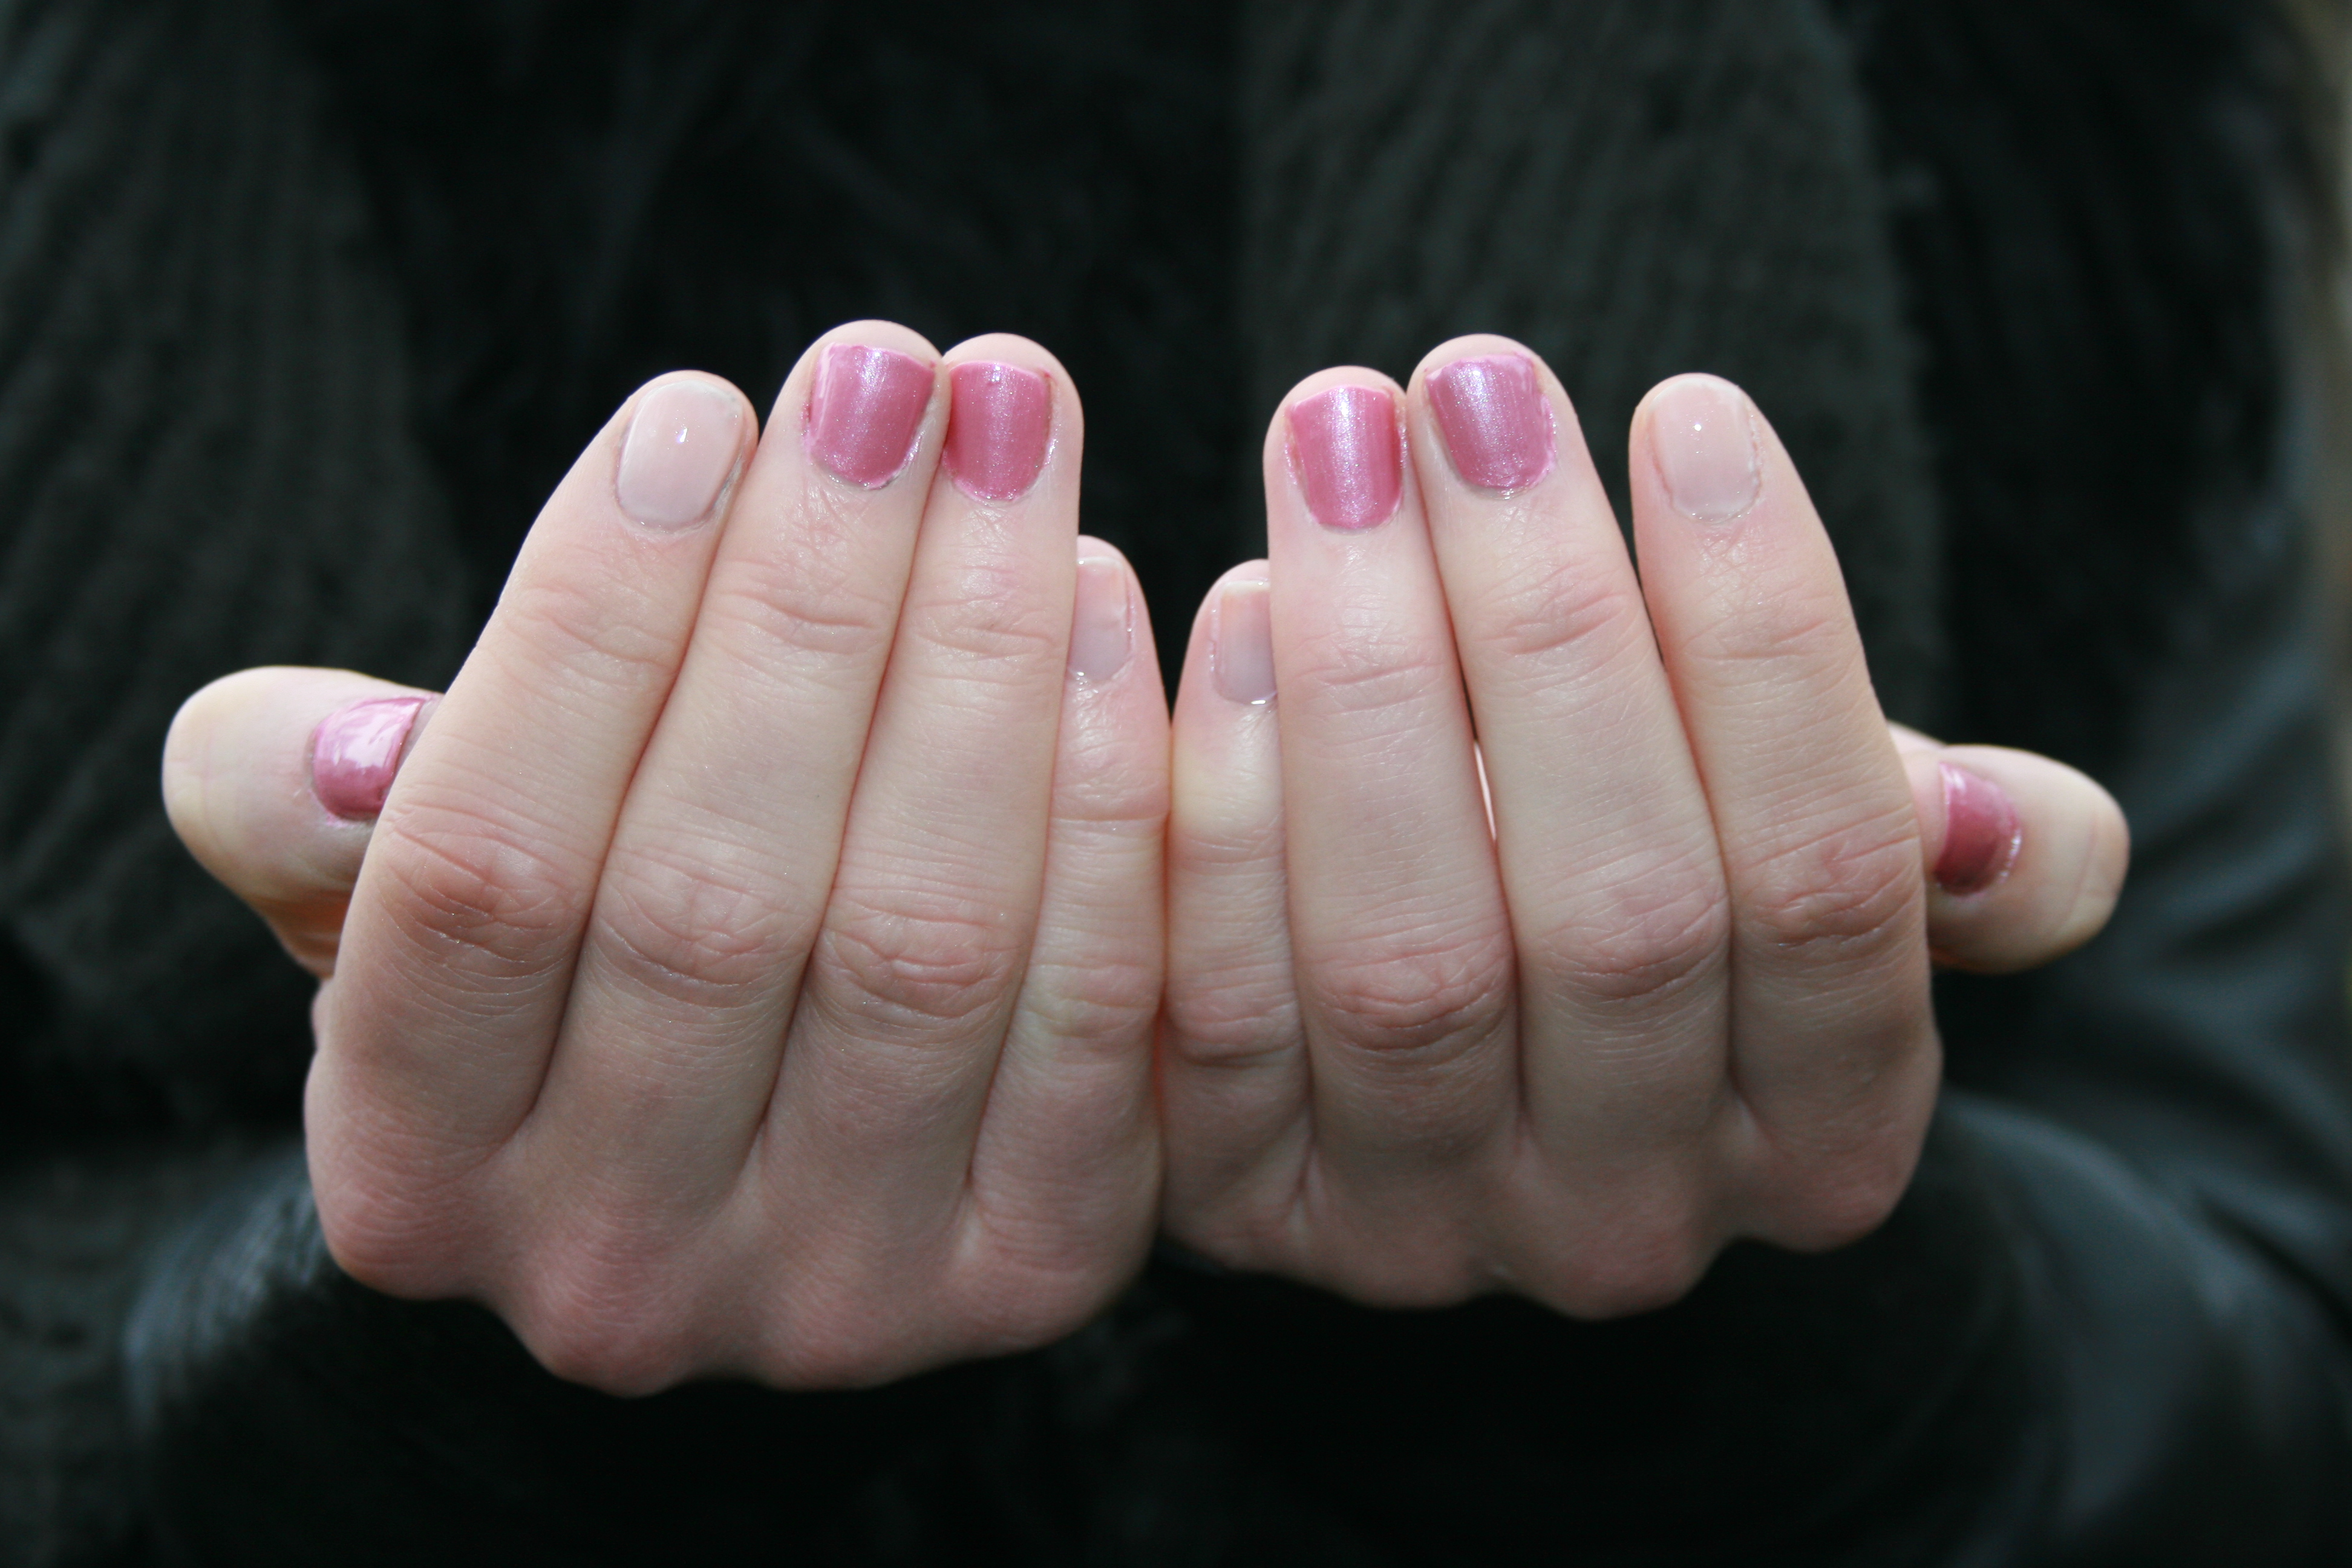 Dior 386 Pink Aristocat Nail Polish | ChocolatesandRaspberries